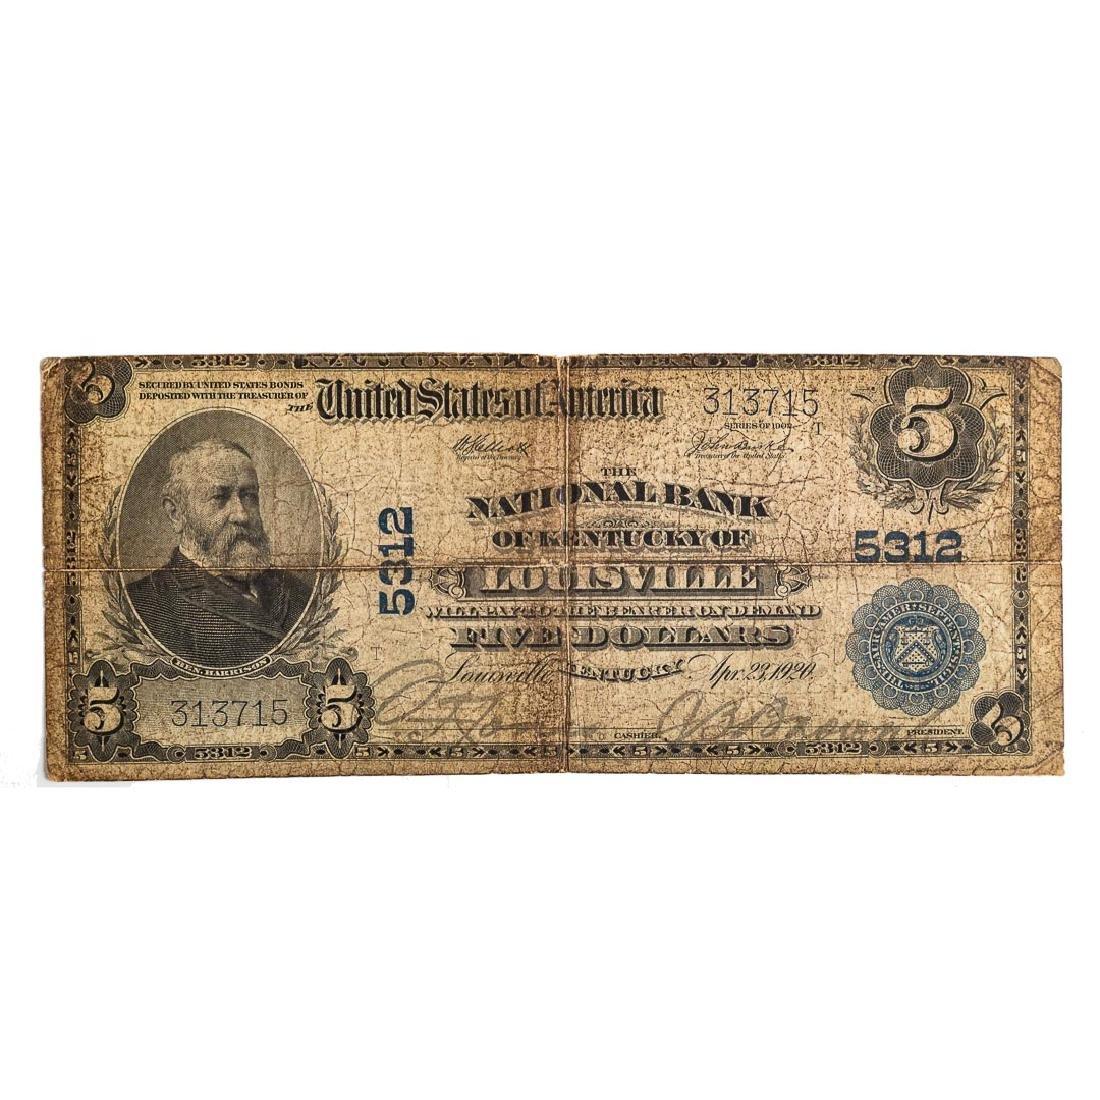 [US] $5 1902 Plain Bank CH# 5312 Fr-607